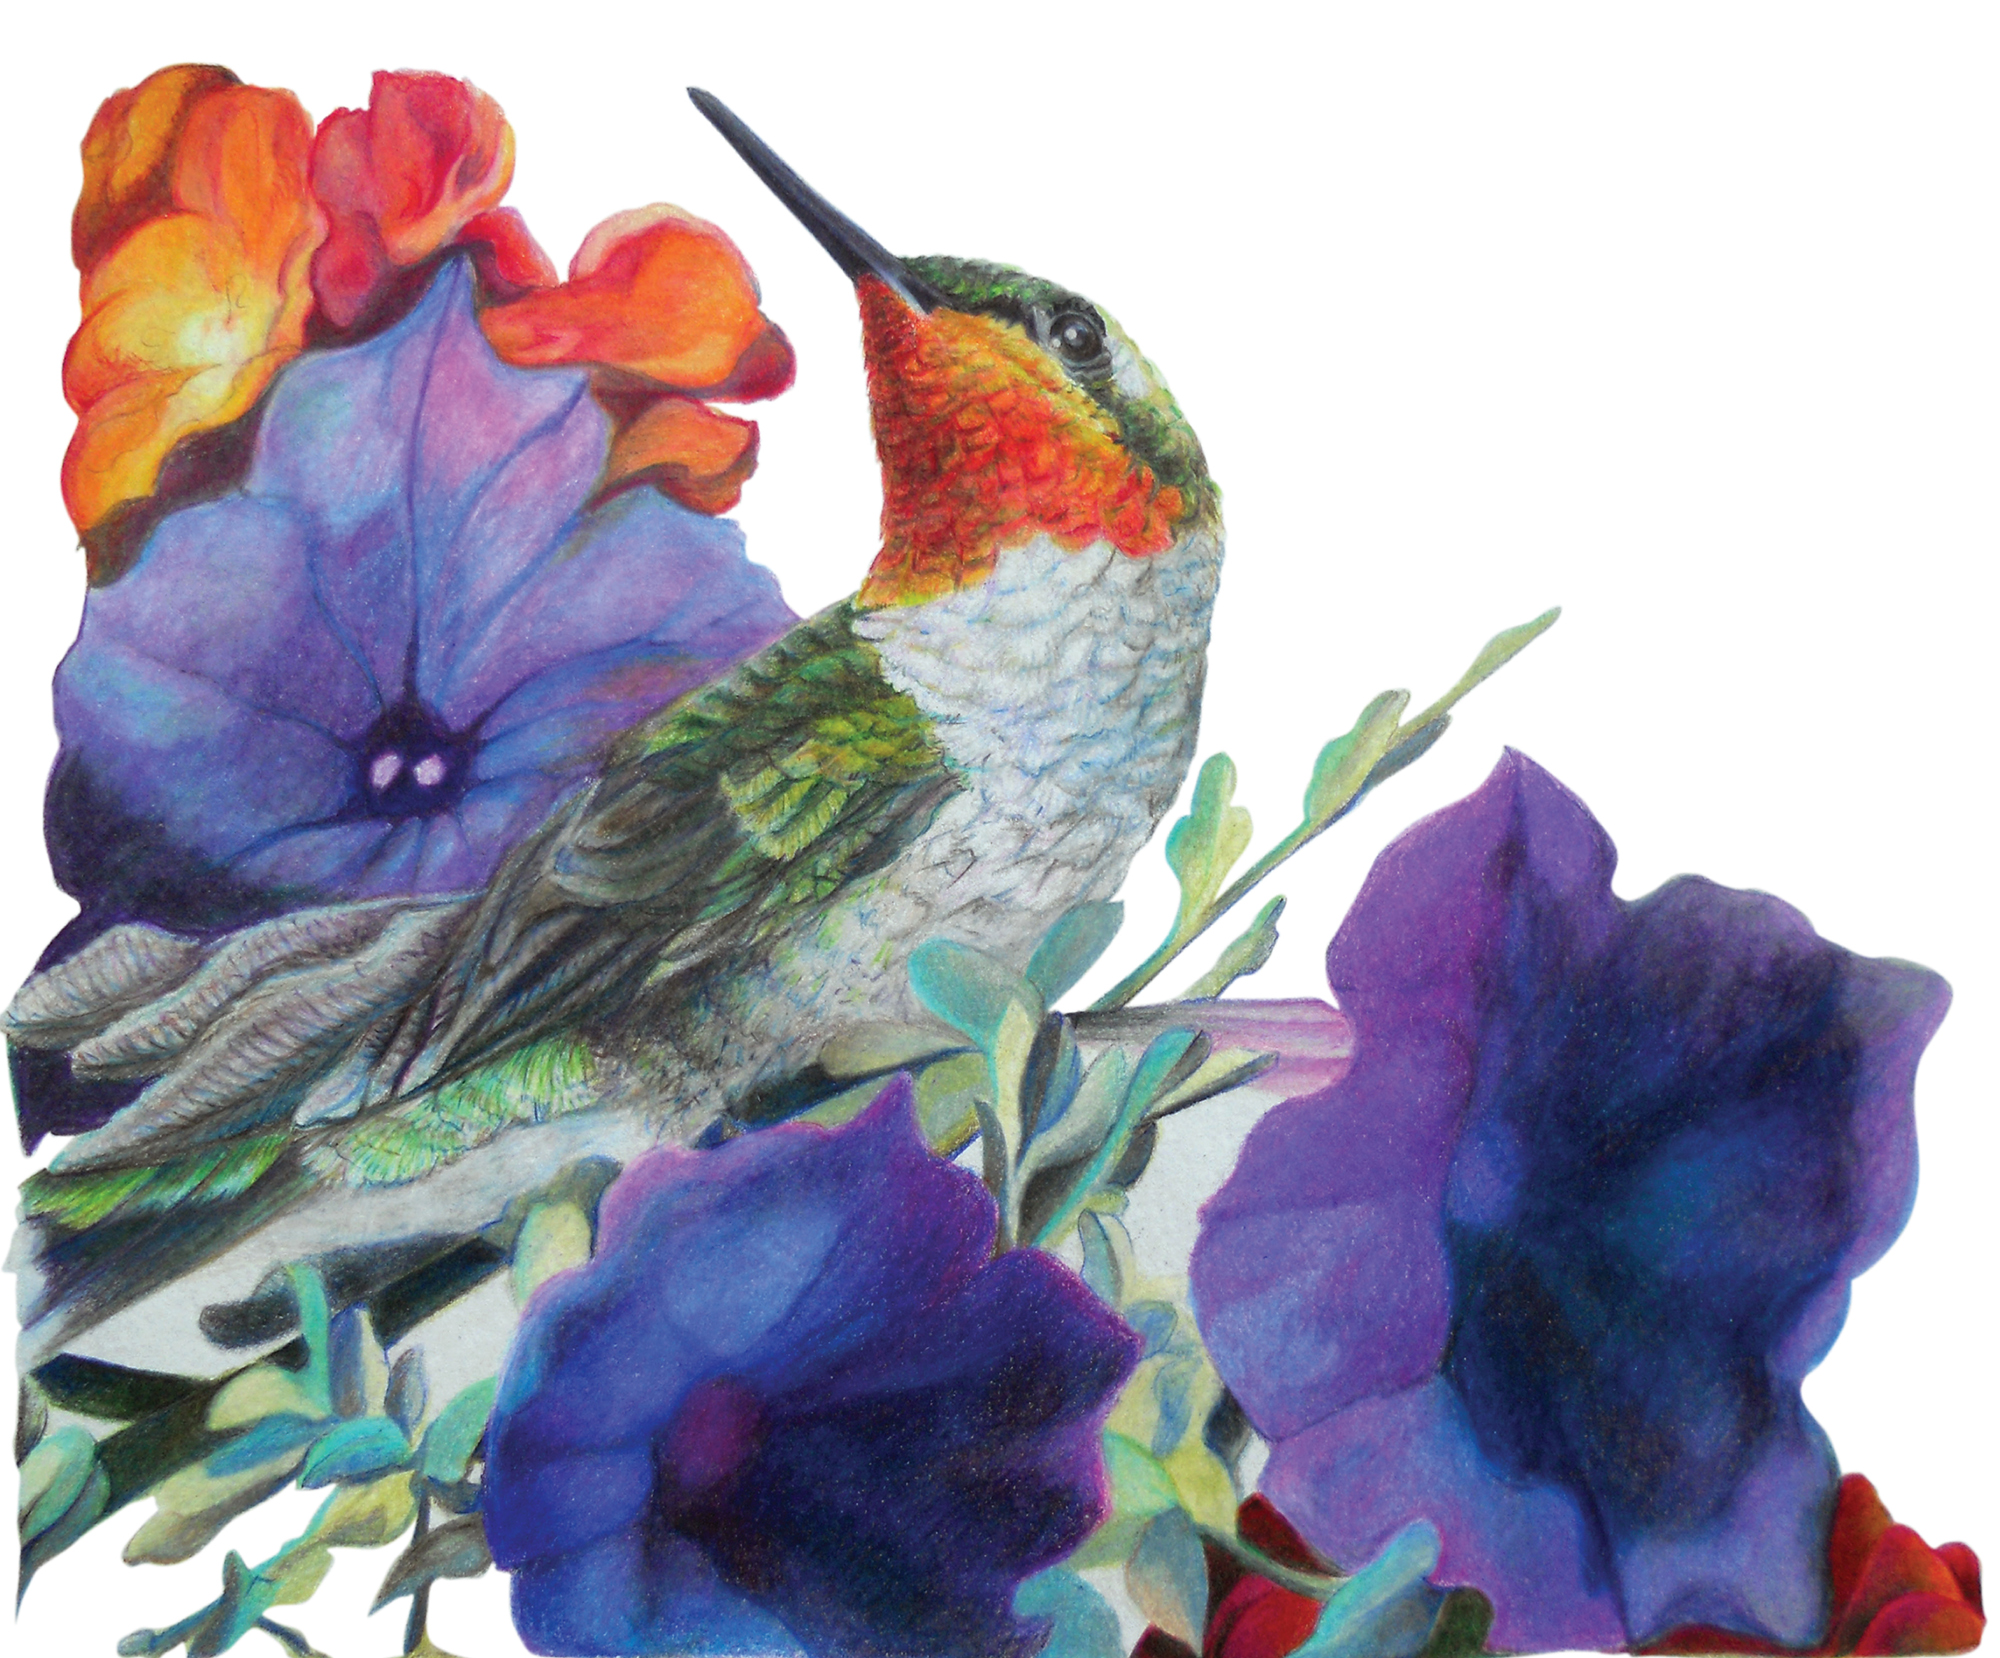 """Pointed Remark"", RubyThroat Hummingbird Prismacolor Original Artwork by Allison Richter"